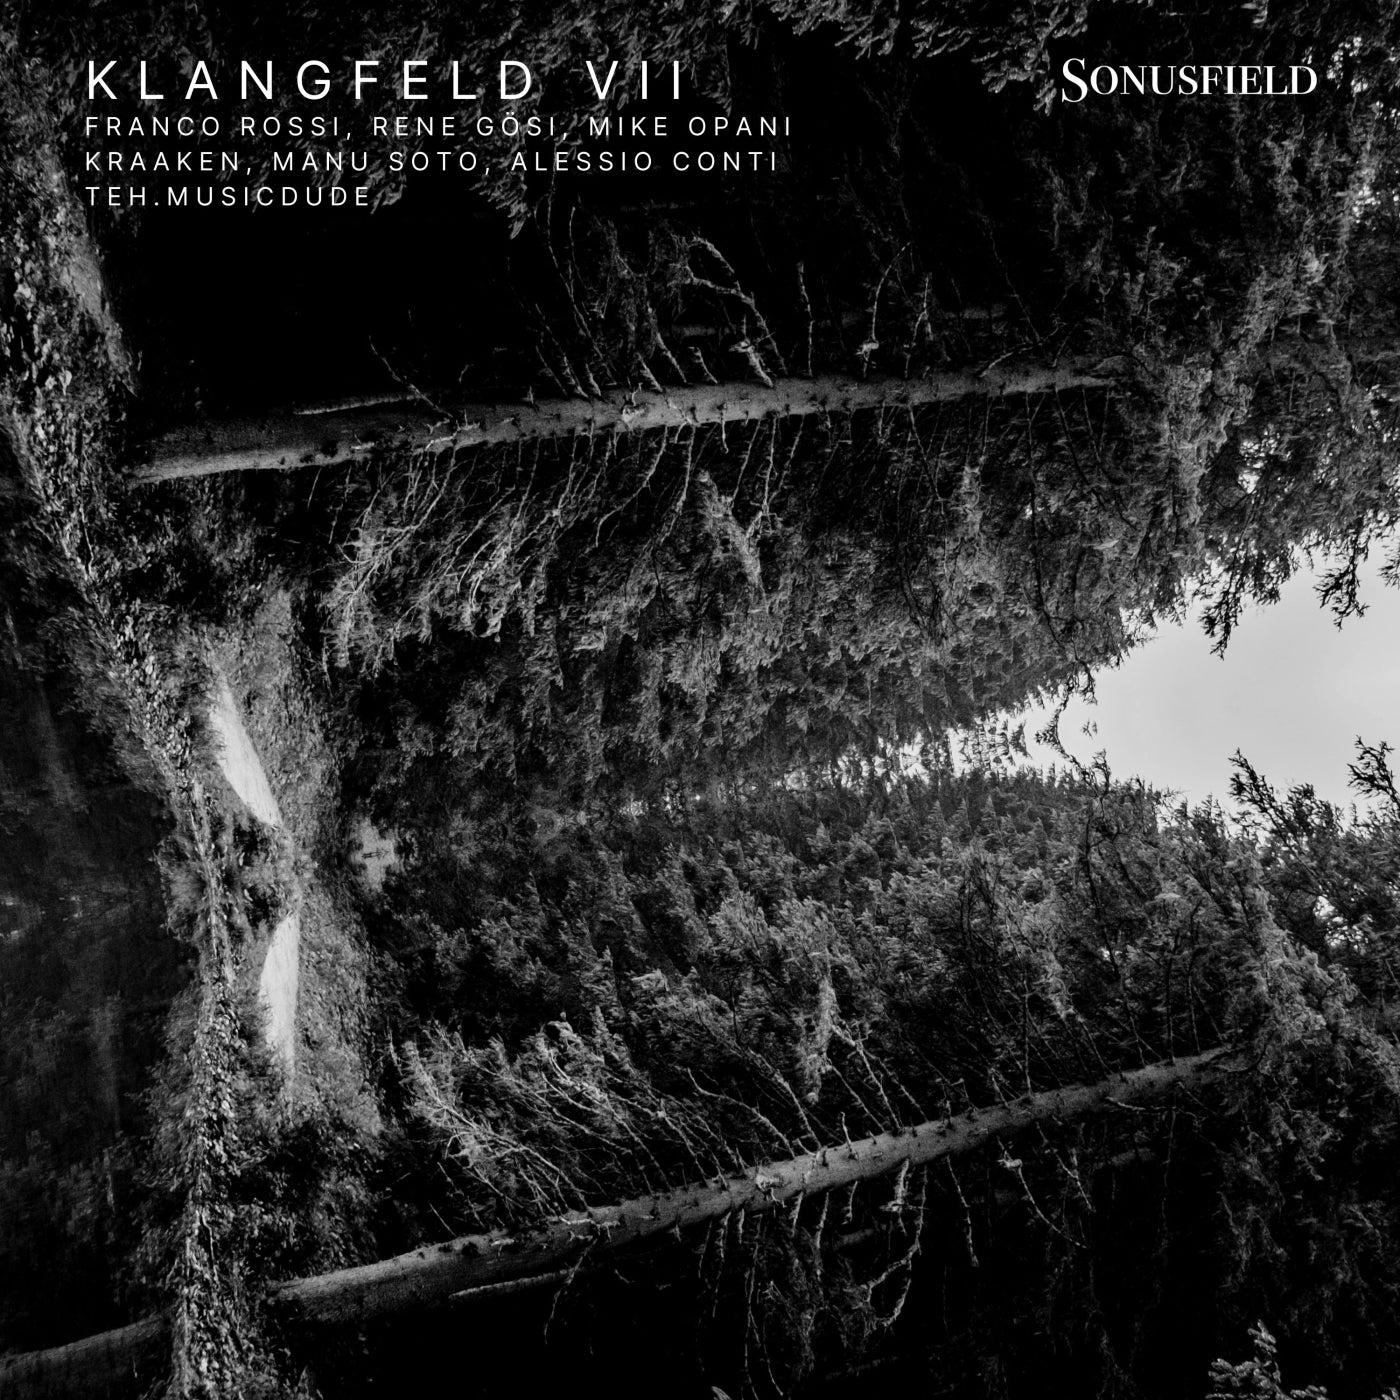 VA - Klangfeld VII [Sonusfield]